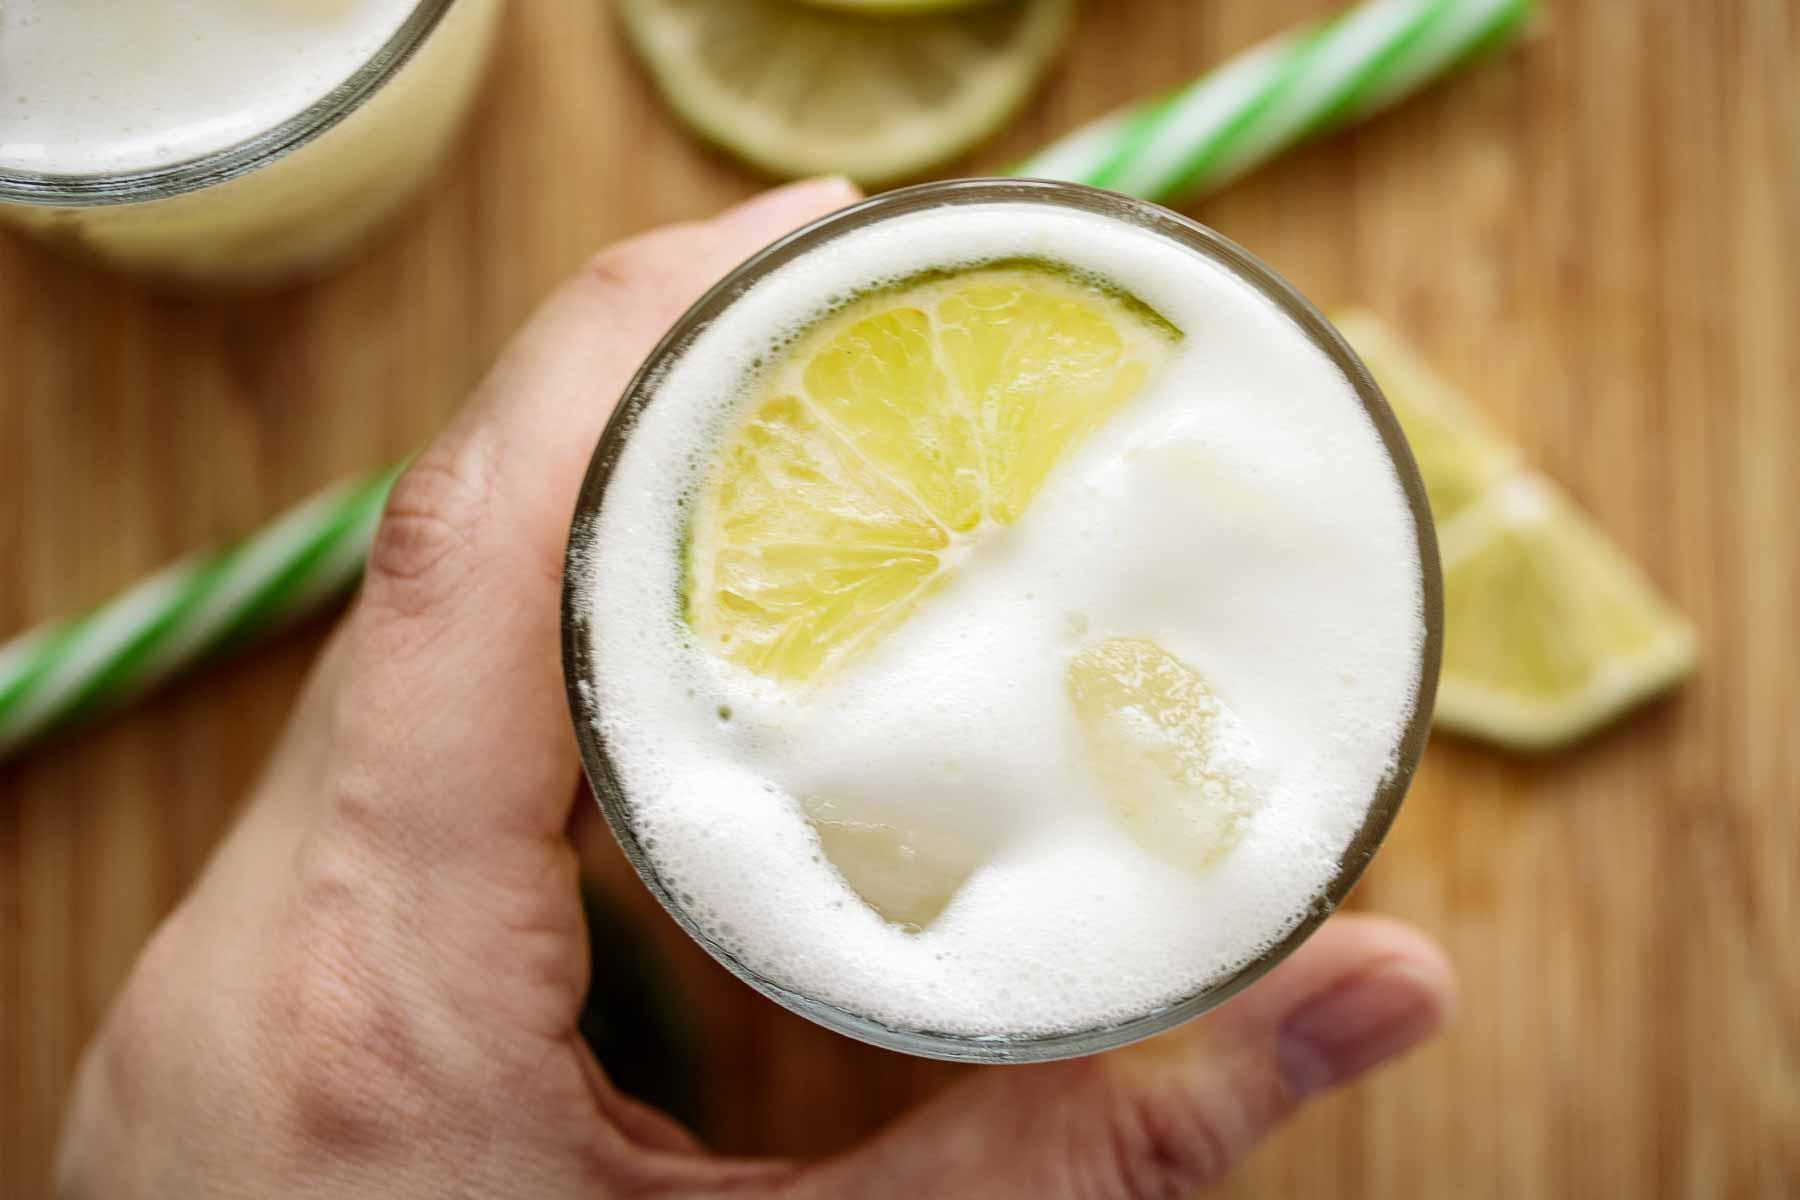 Hand holding a glass of Brazilian lemonade.